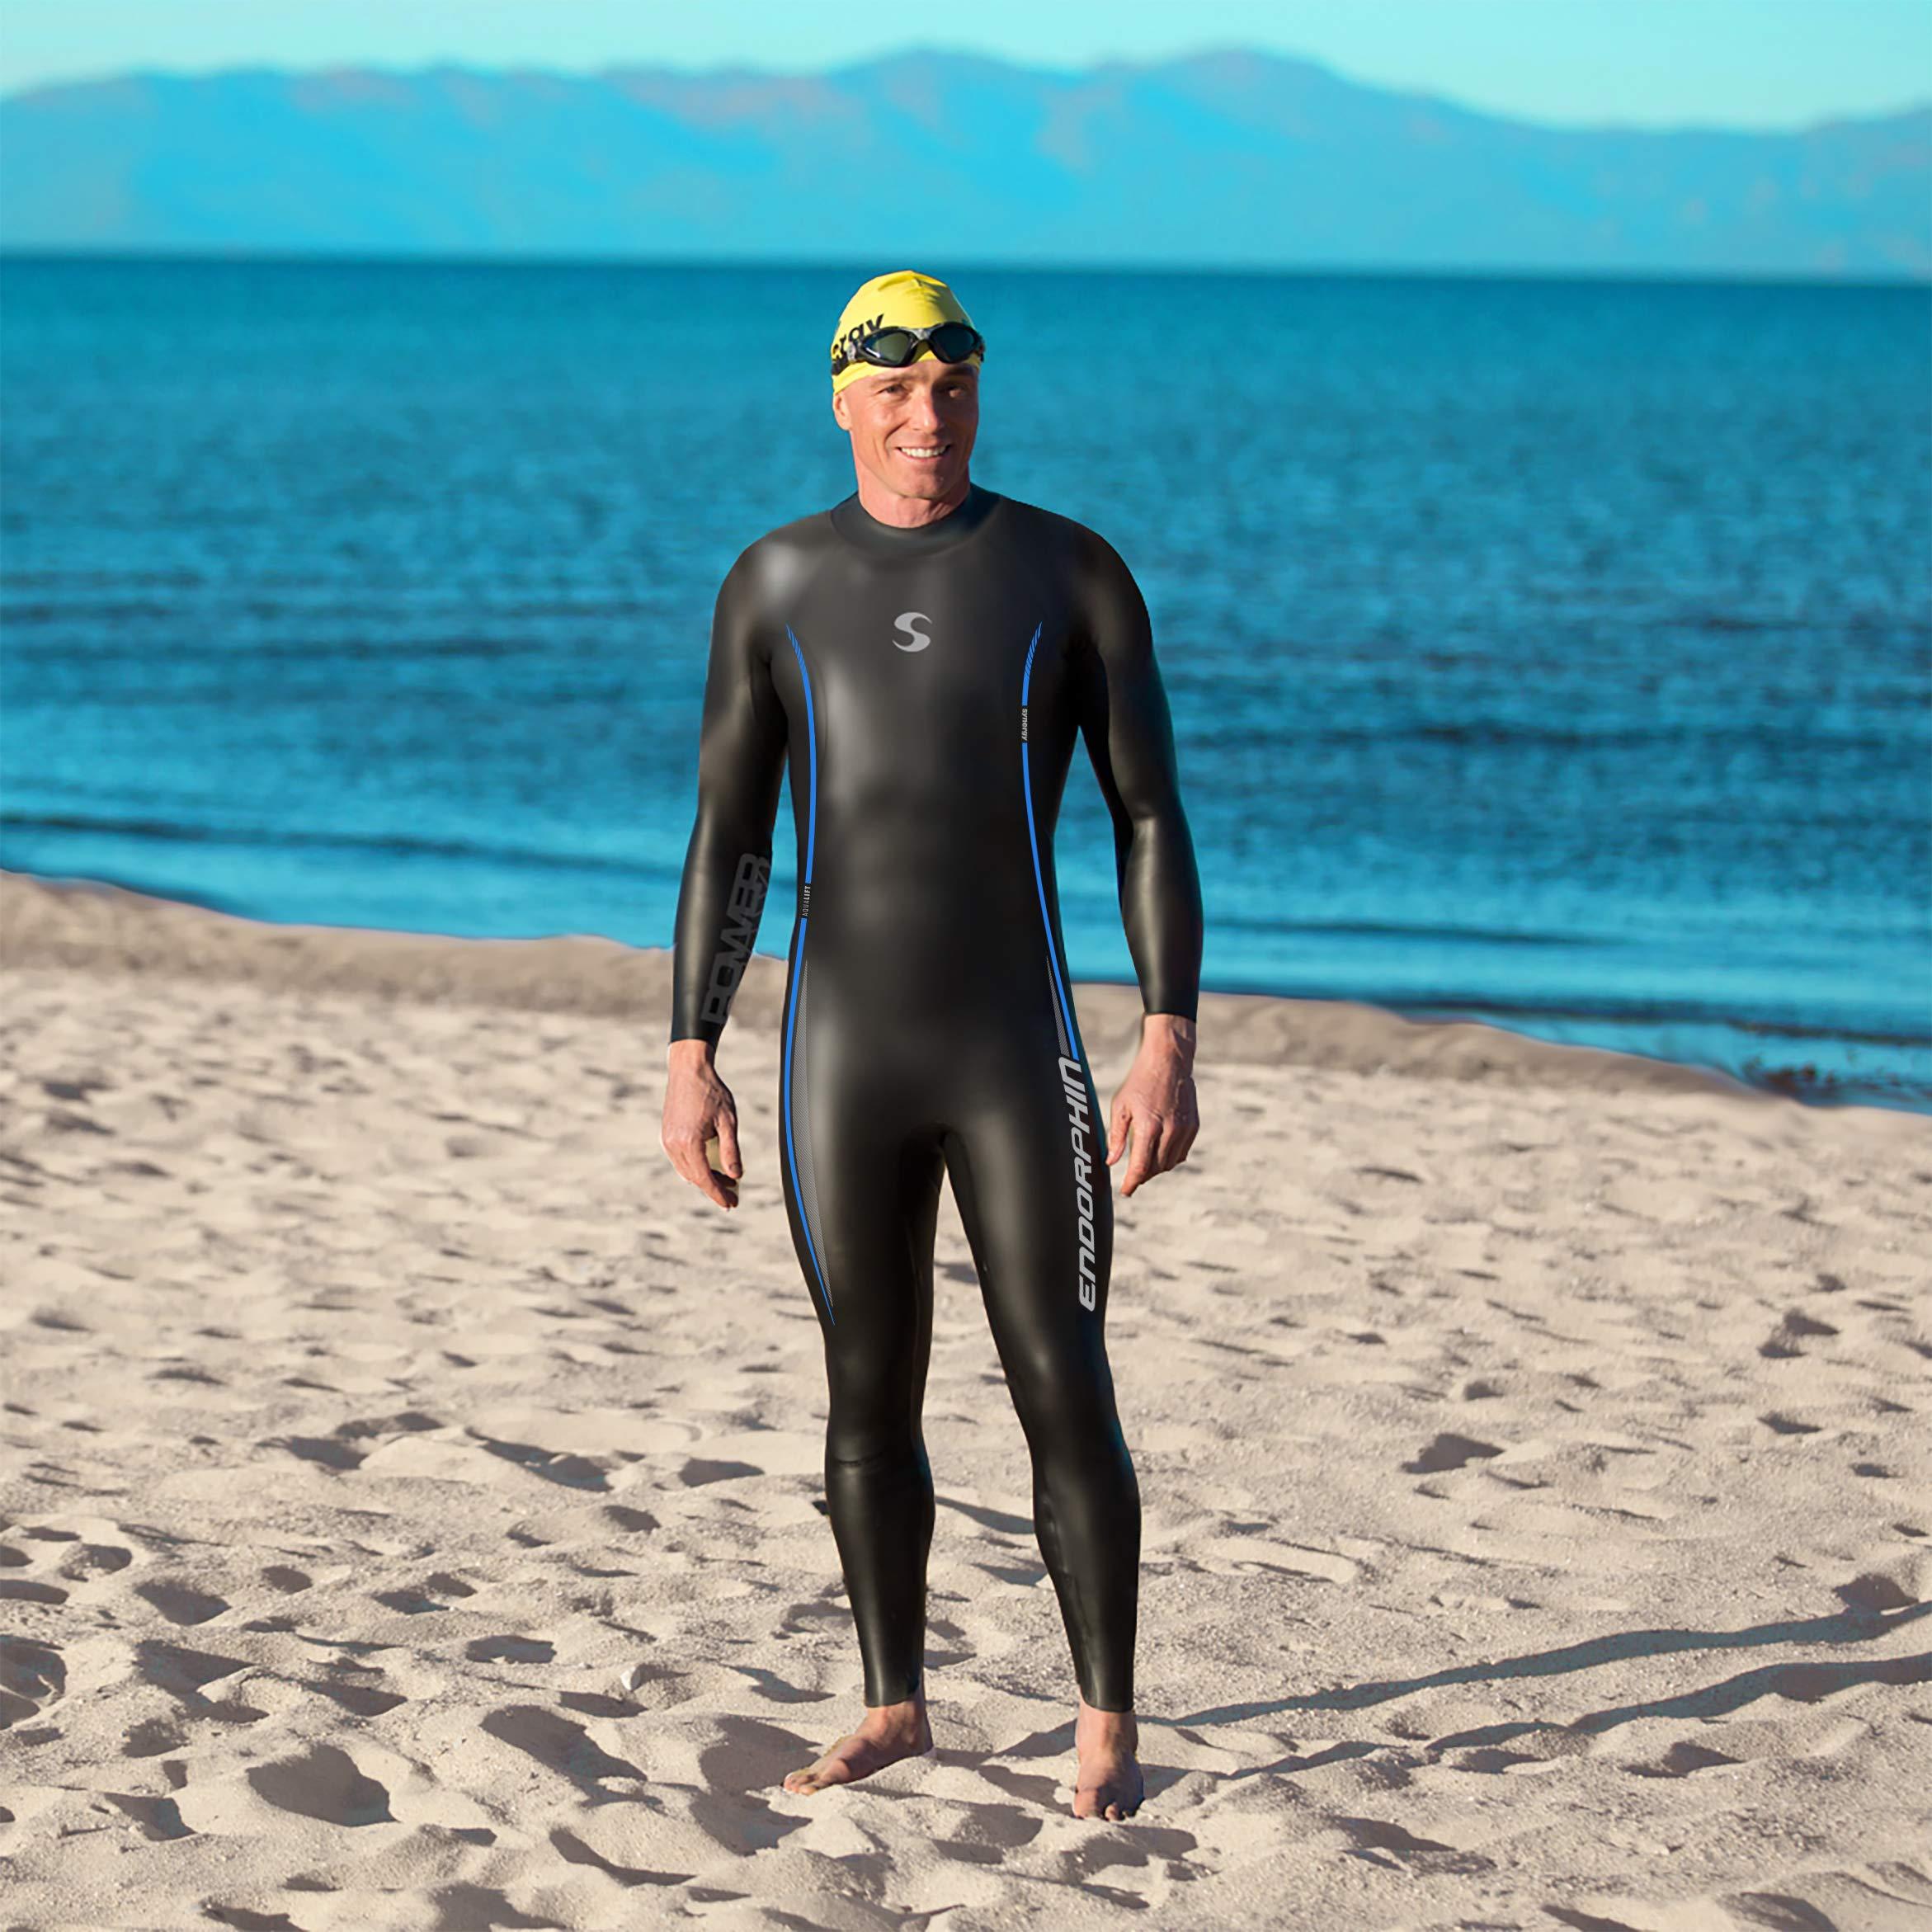 Synergy Endorphin Men's Full Sleeve Triathlon Wetsuit (M3) by Synergy (Image #5)